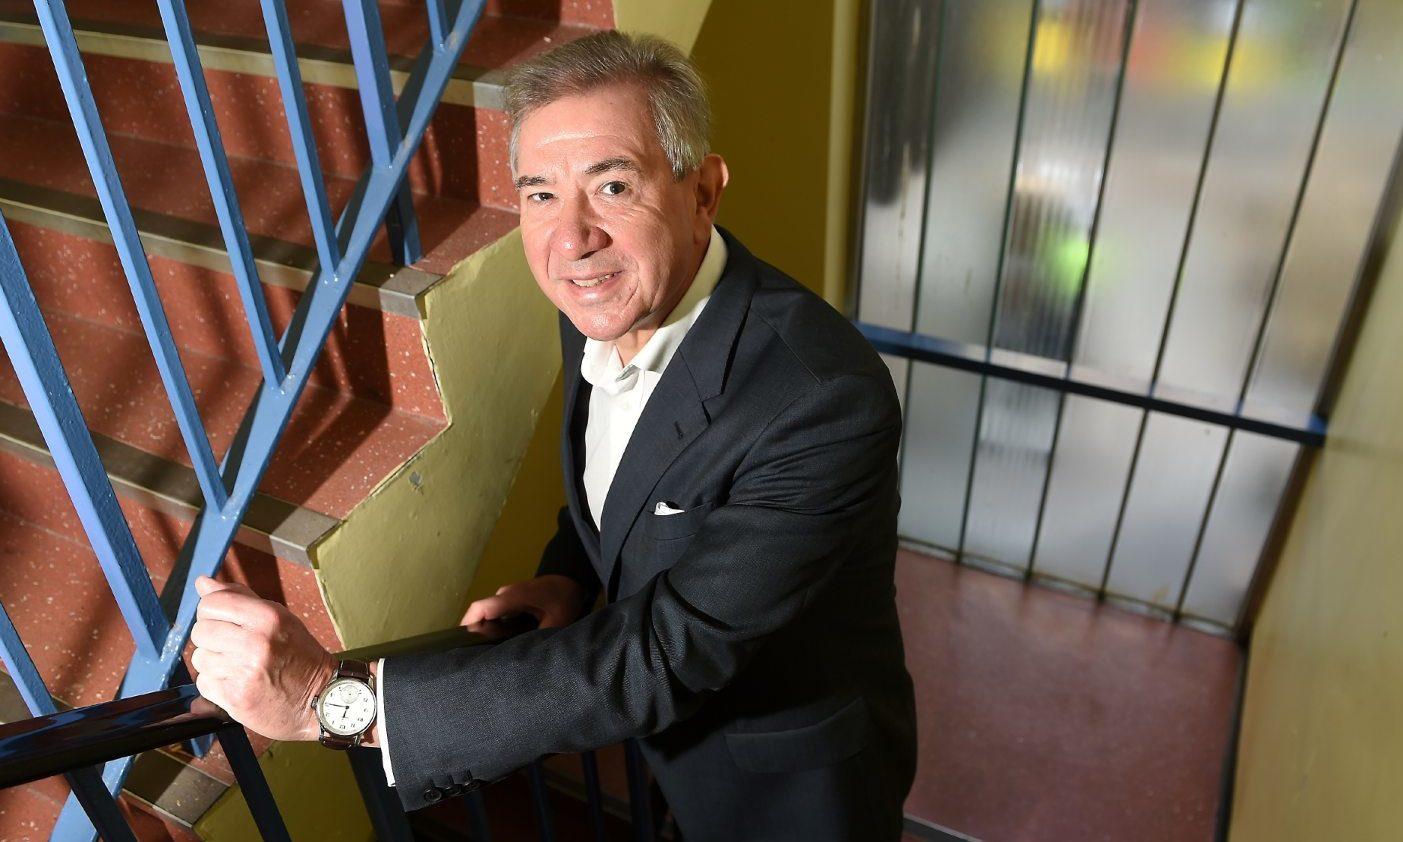 Inverness hotelier Tony Story.